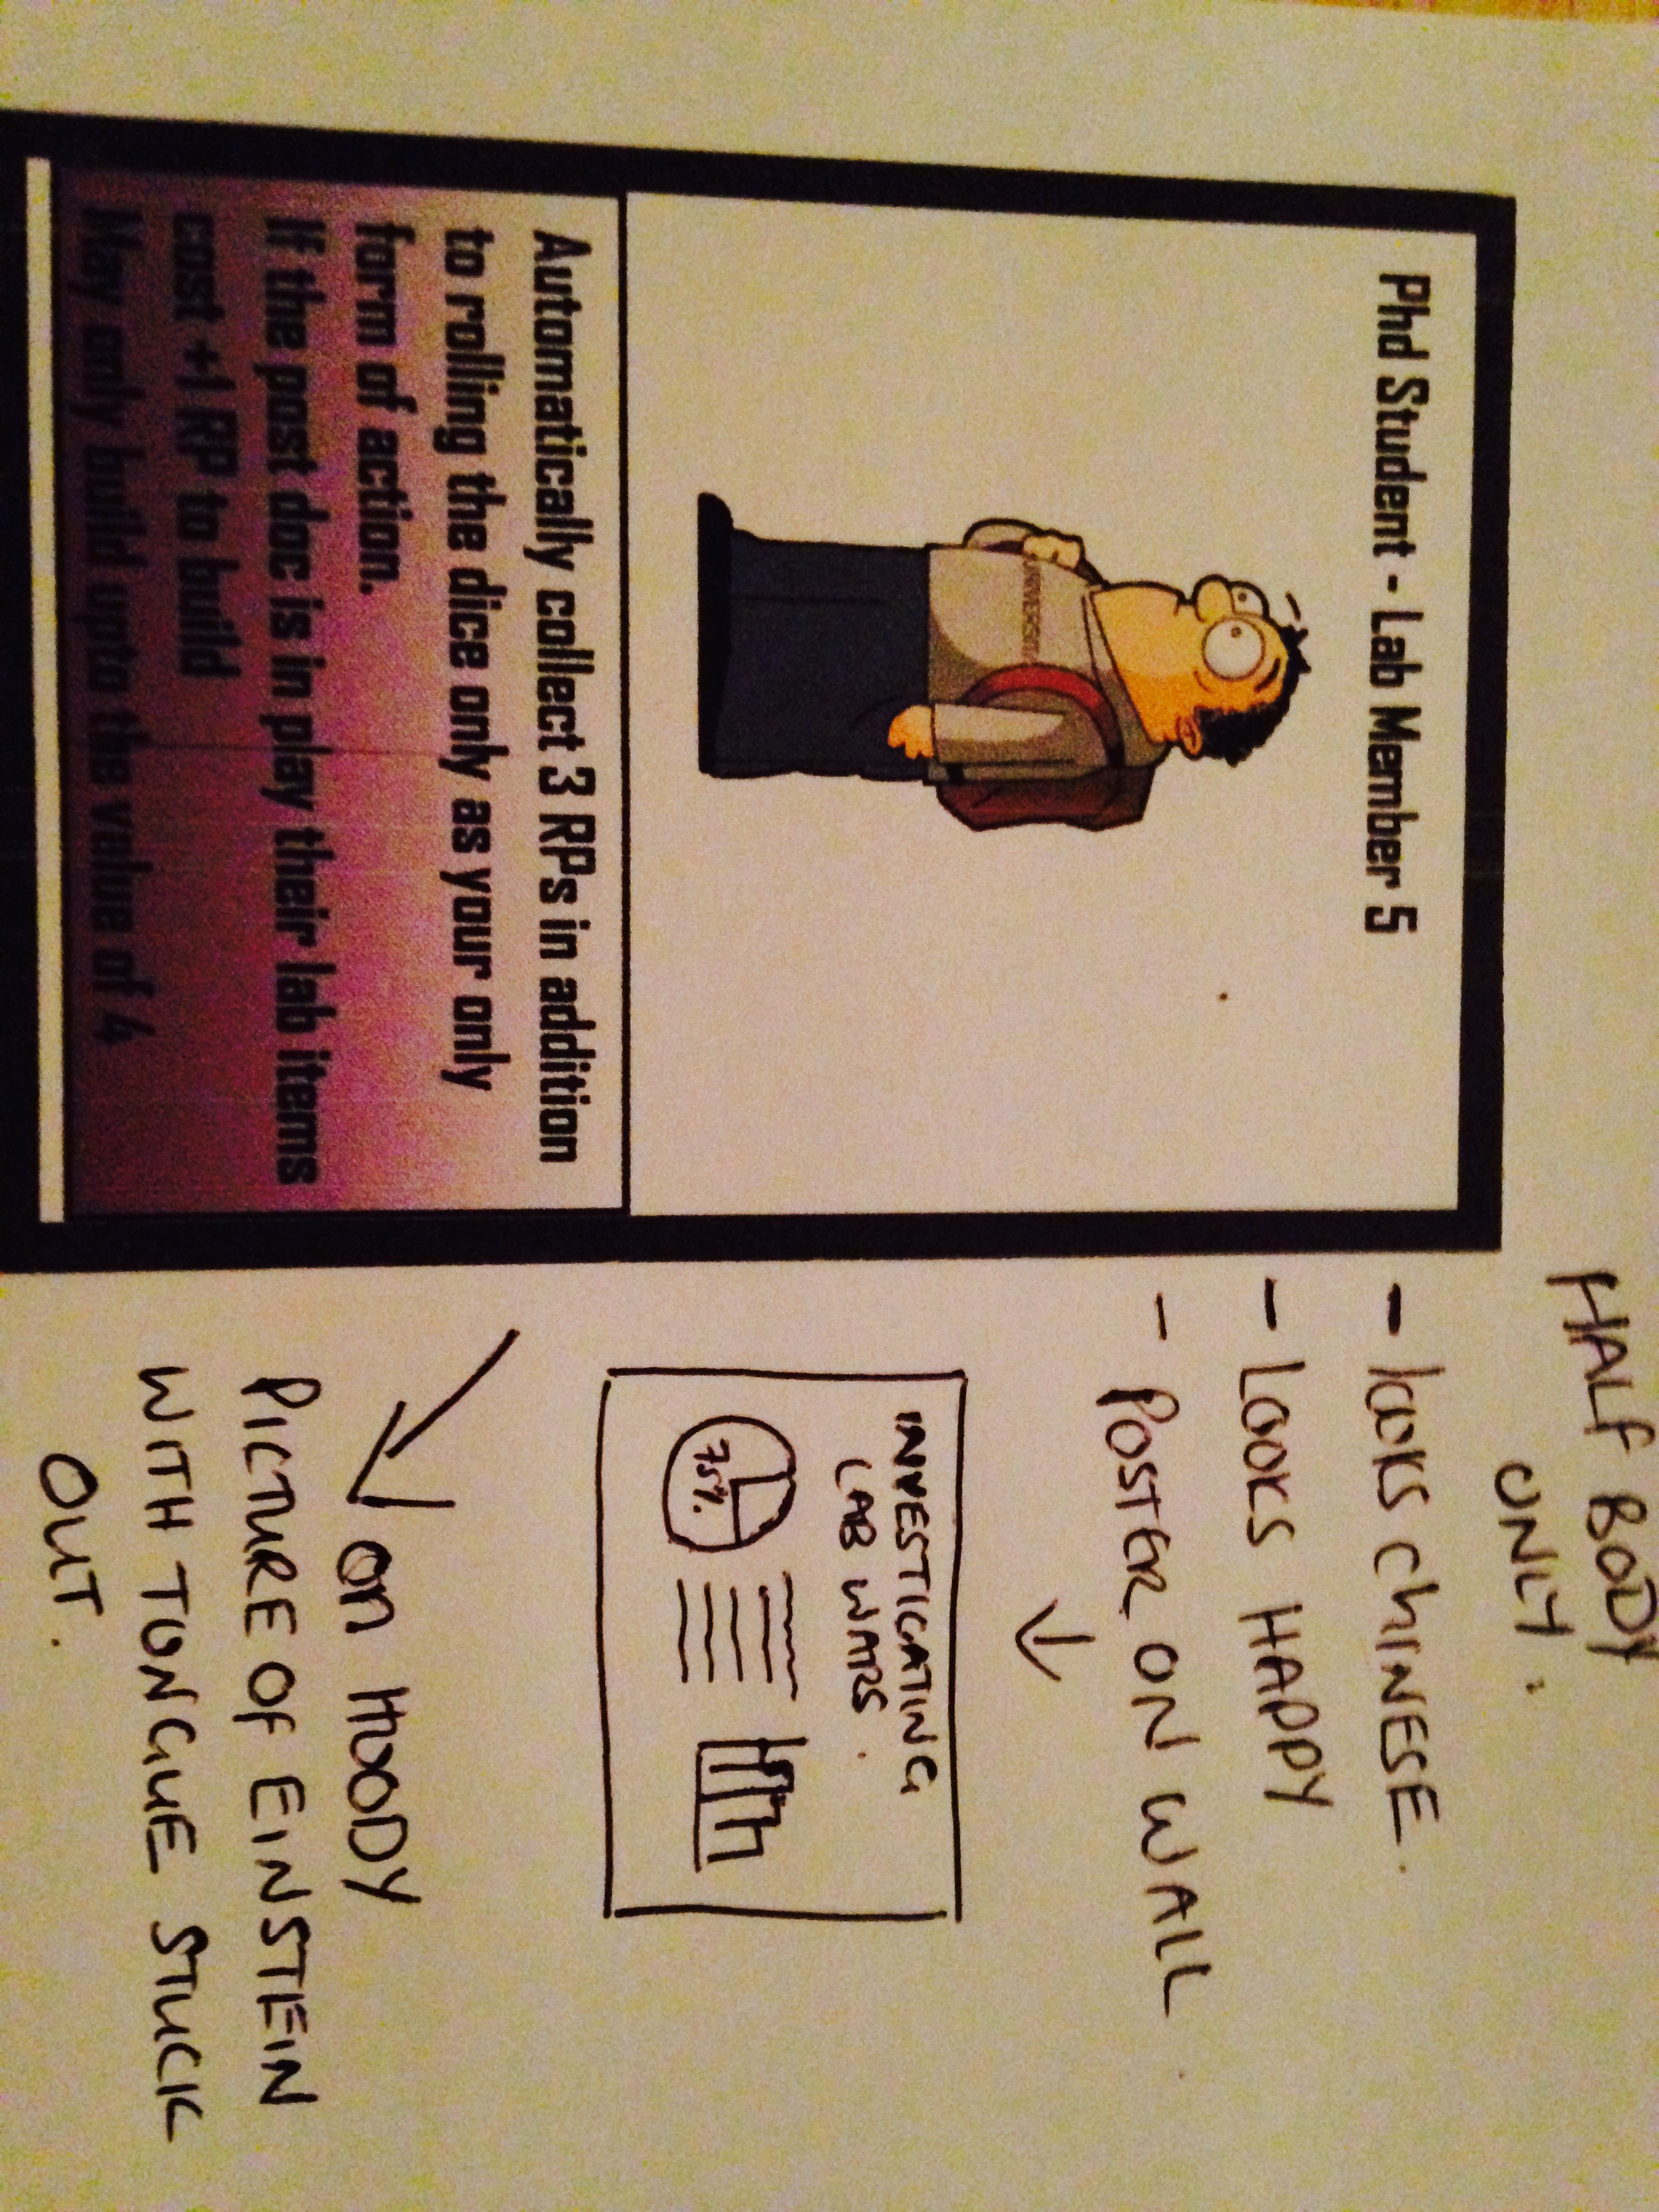 Illustrator instructions